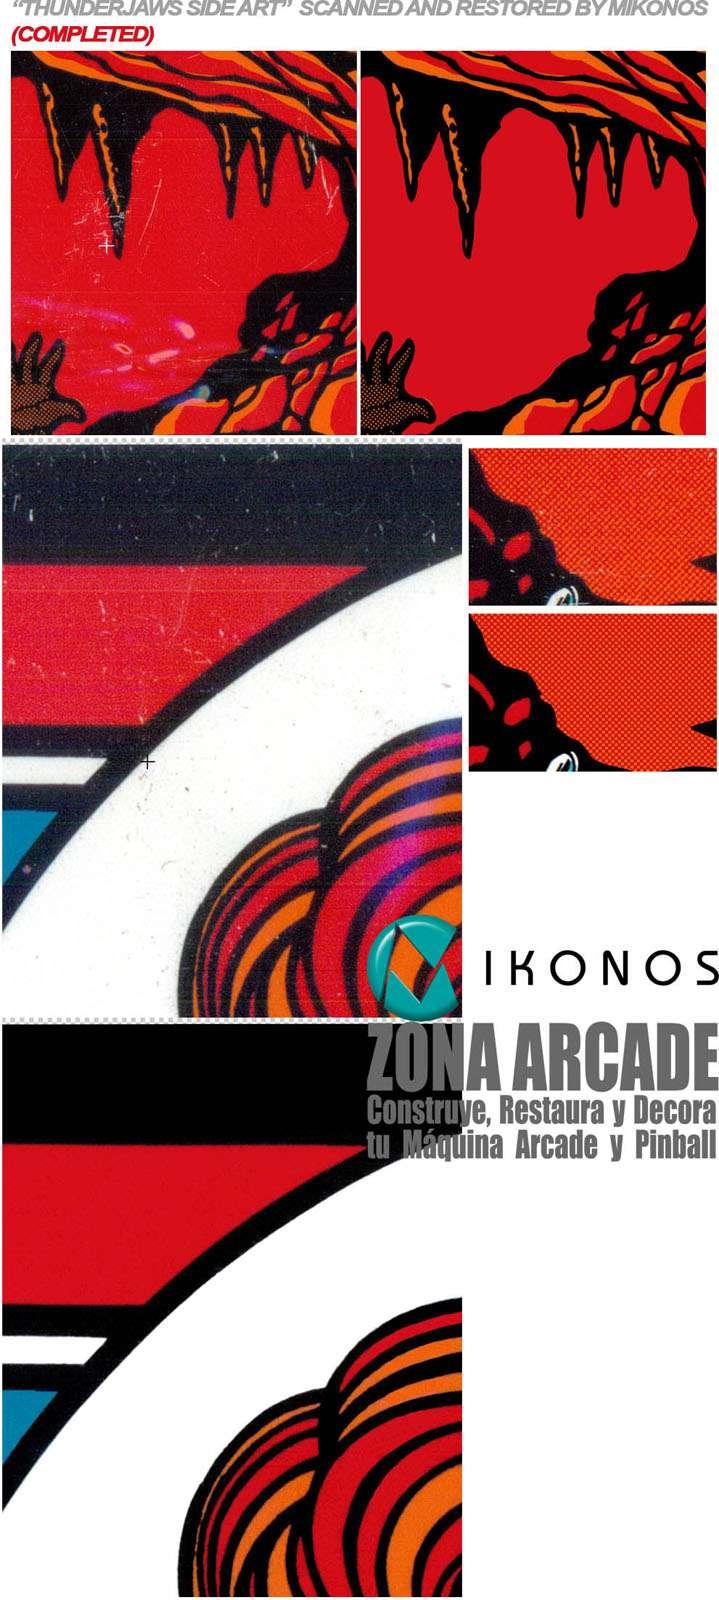 Arcade artwork Gallery of Zona Arcade and reproductions  Mik